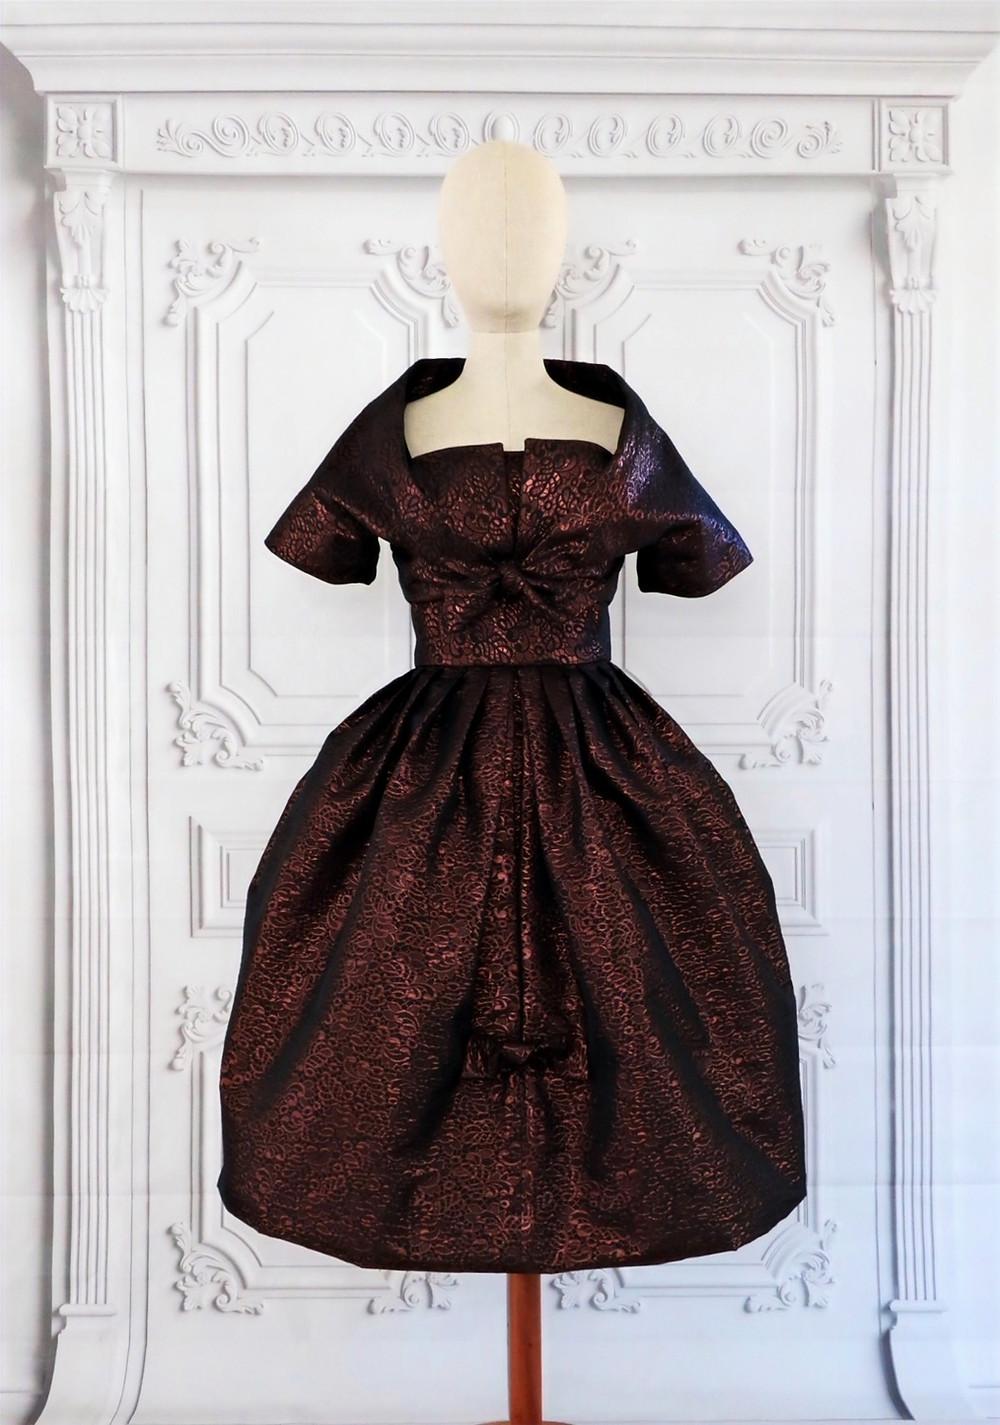 Dress and Bolero designed by Simonetta, Pattern Vogue 101 V101 year 1958